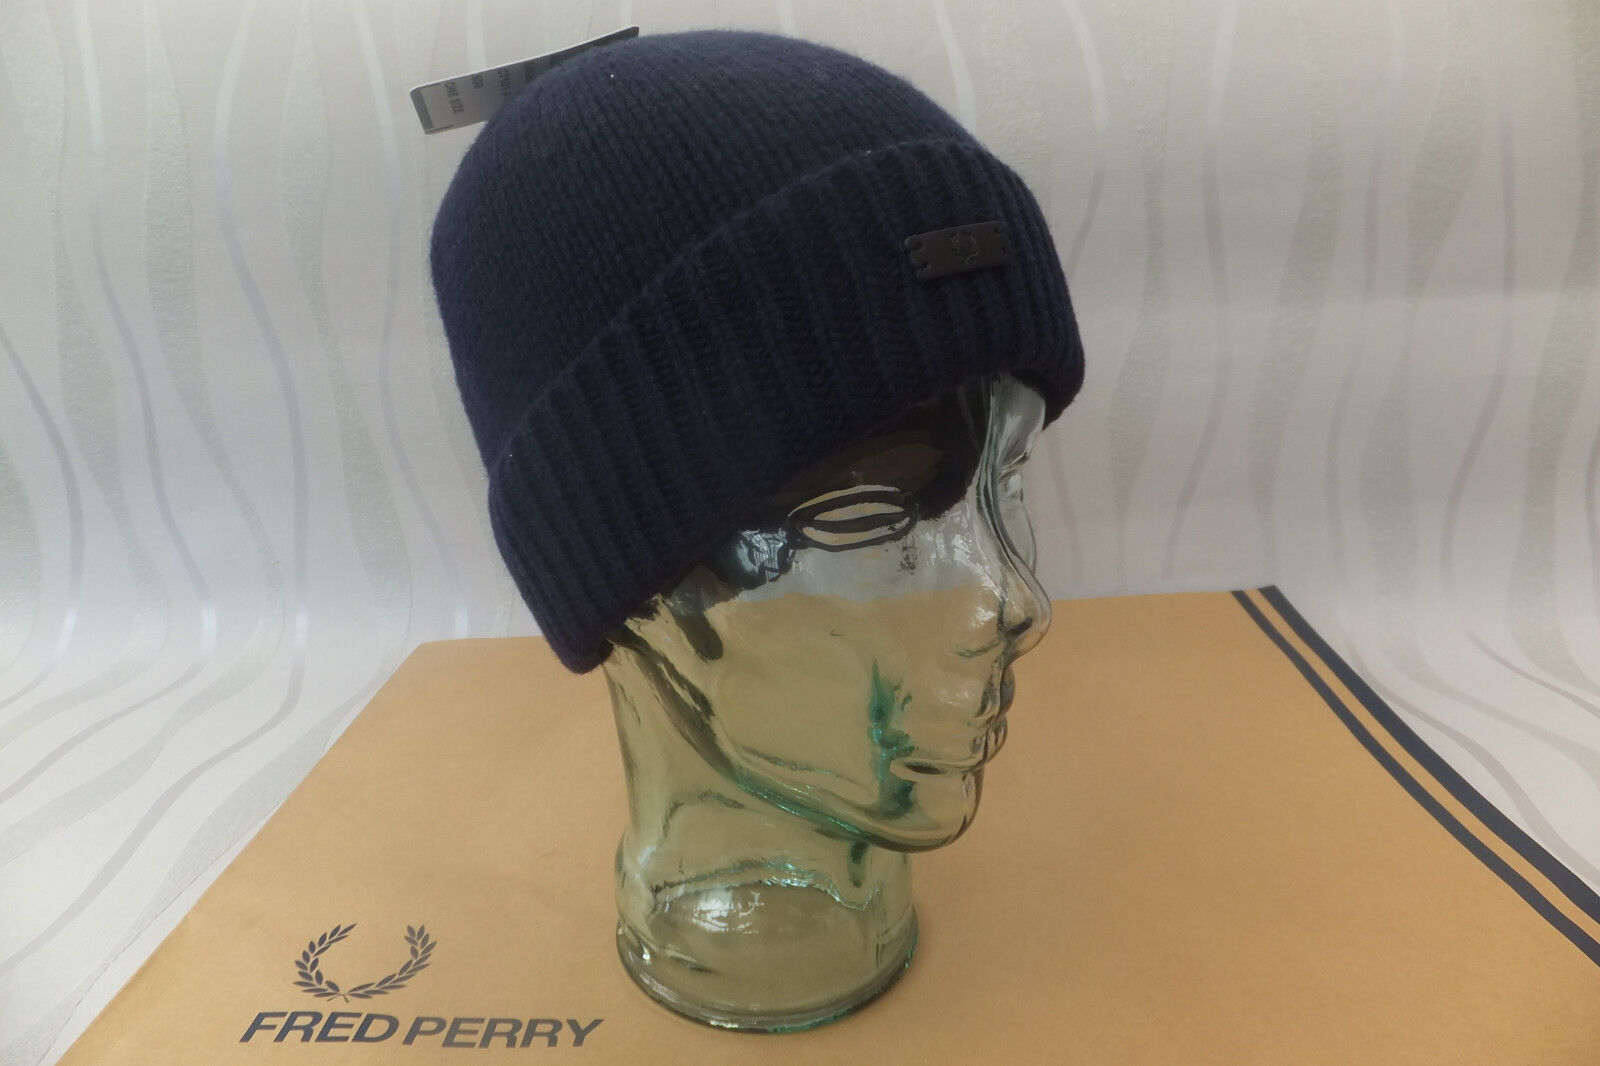 6560da0fe FRED PERRY Beanie Men's Ribbed Knit Navy Hat Turn up Wool Skull Cap BNWT